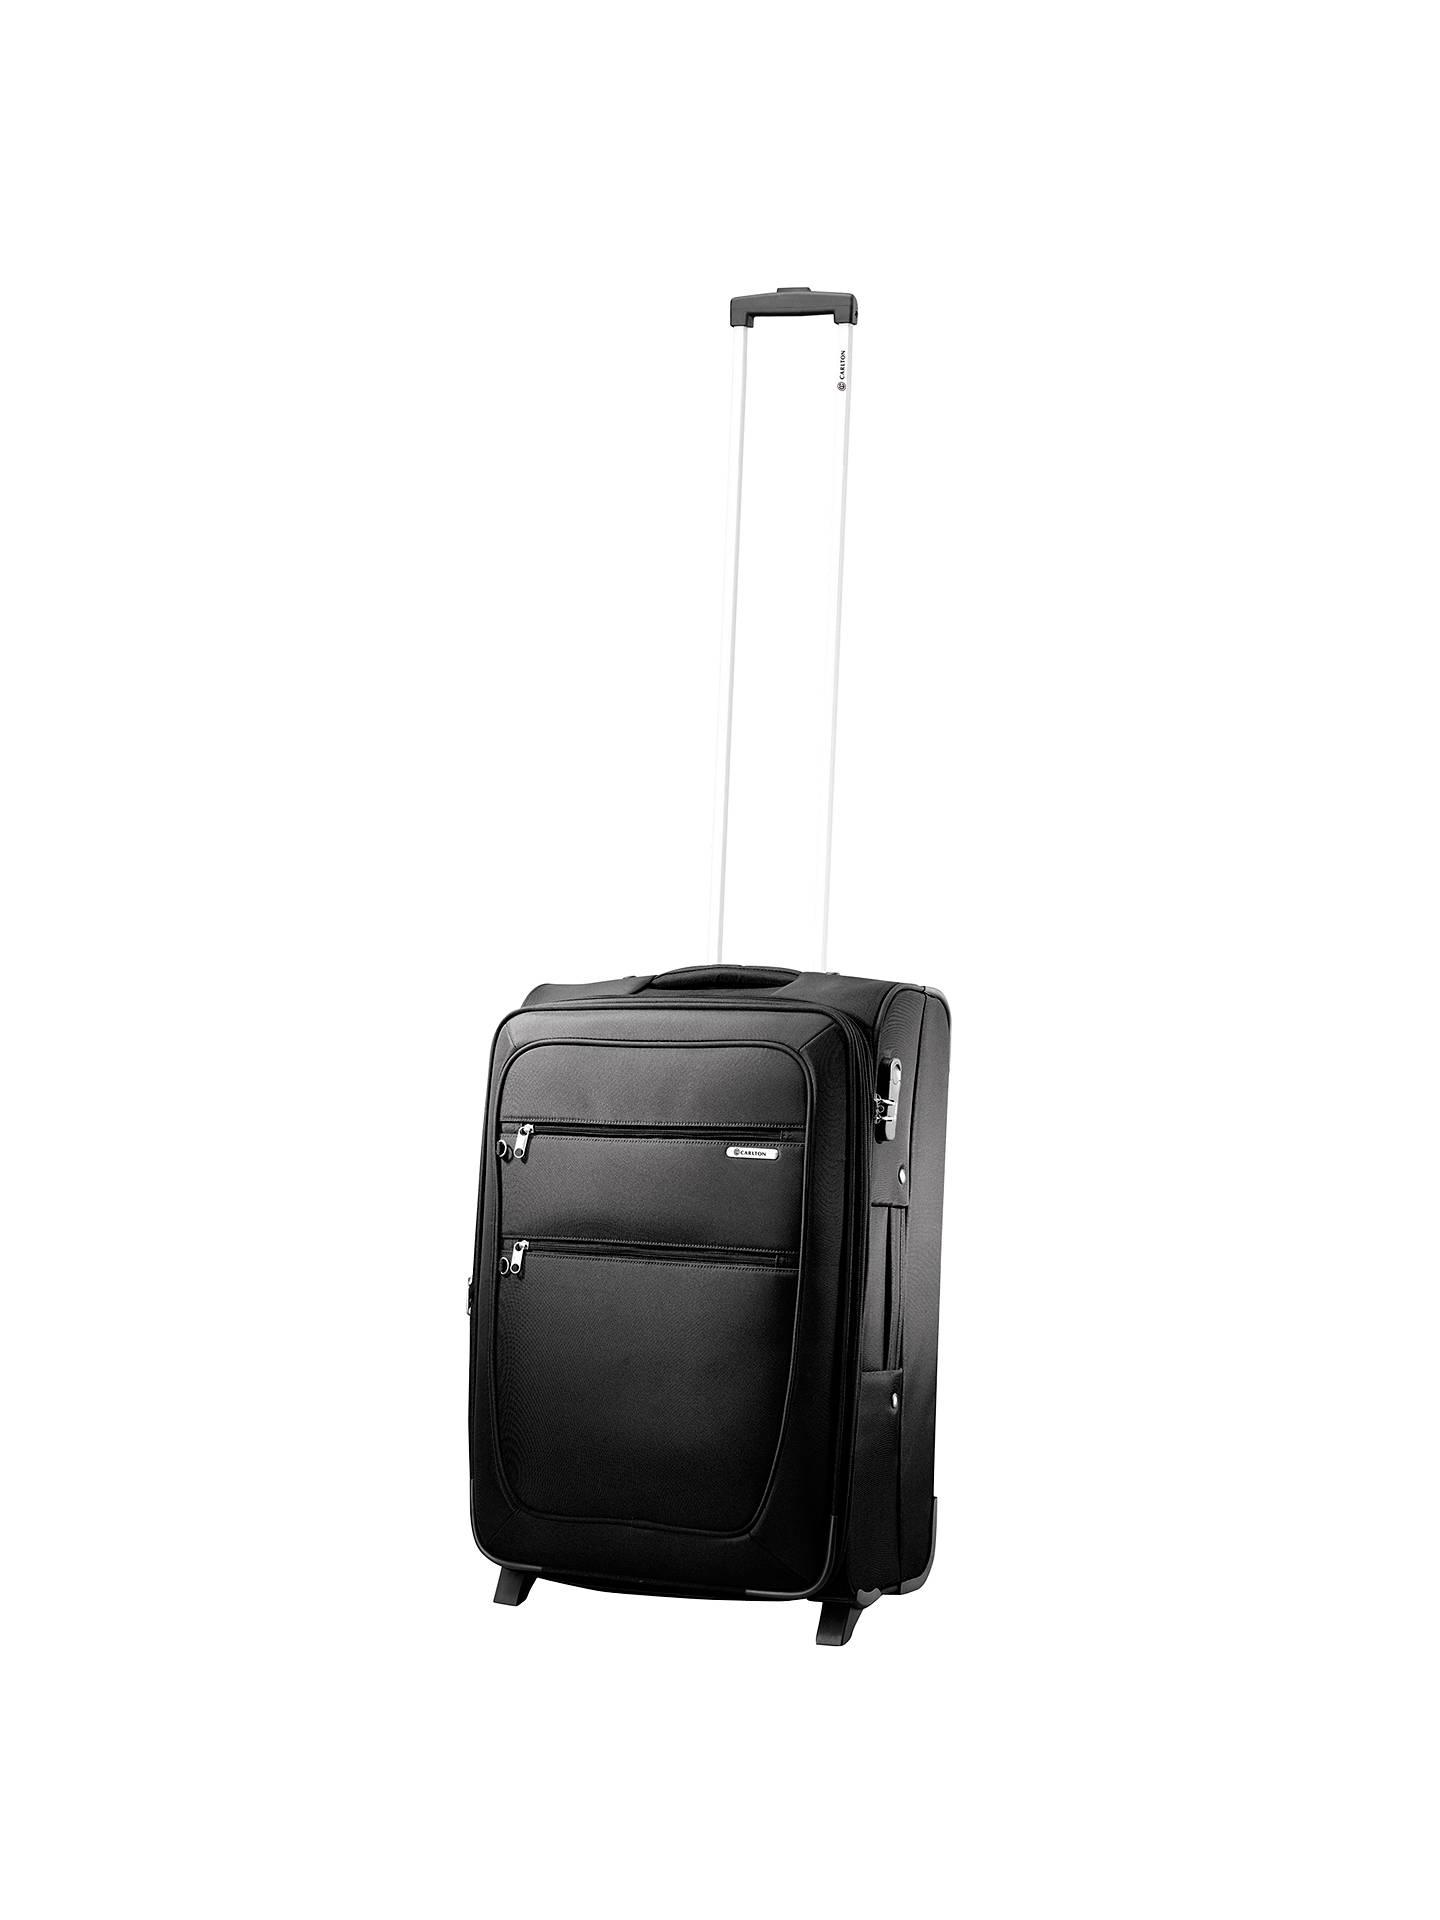 74ce6e9031 Buy Carlton Orchid Expandable 2-Wheel Suitcase